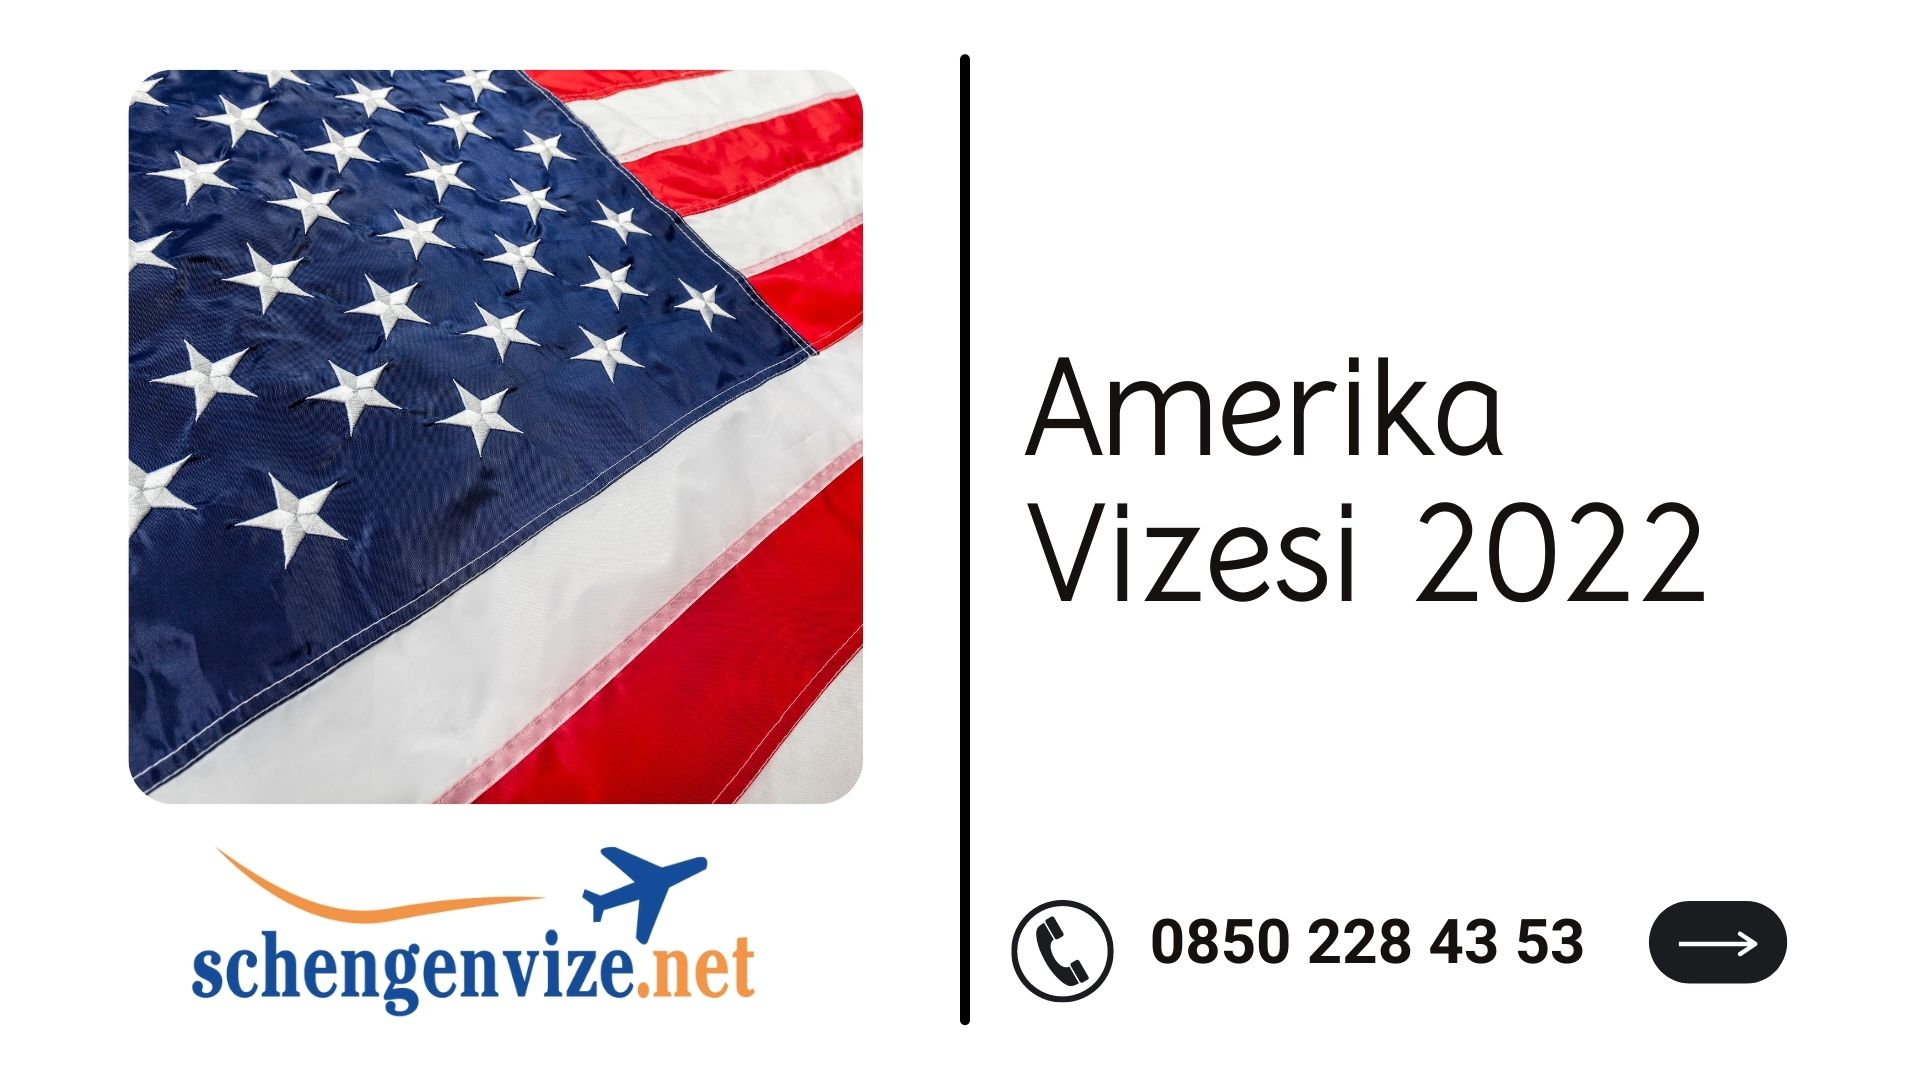 Amerika Vizesi 2022